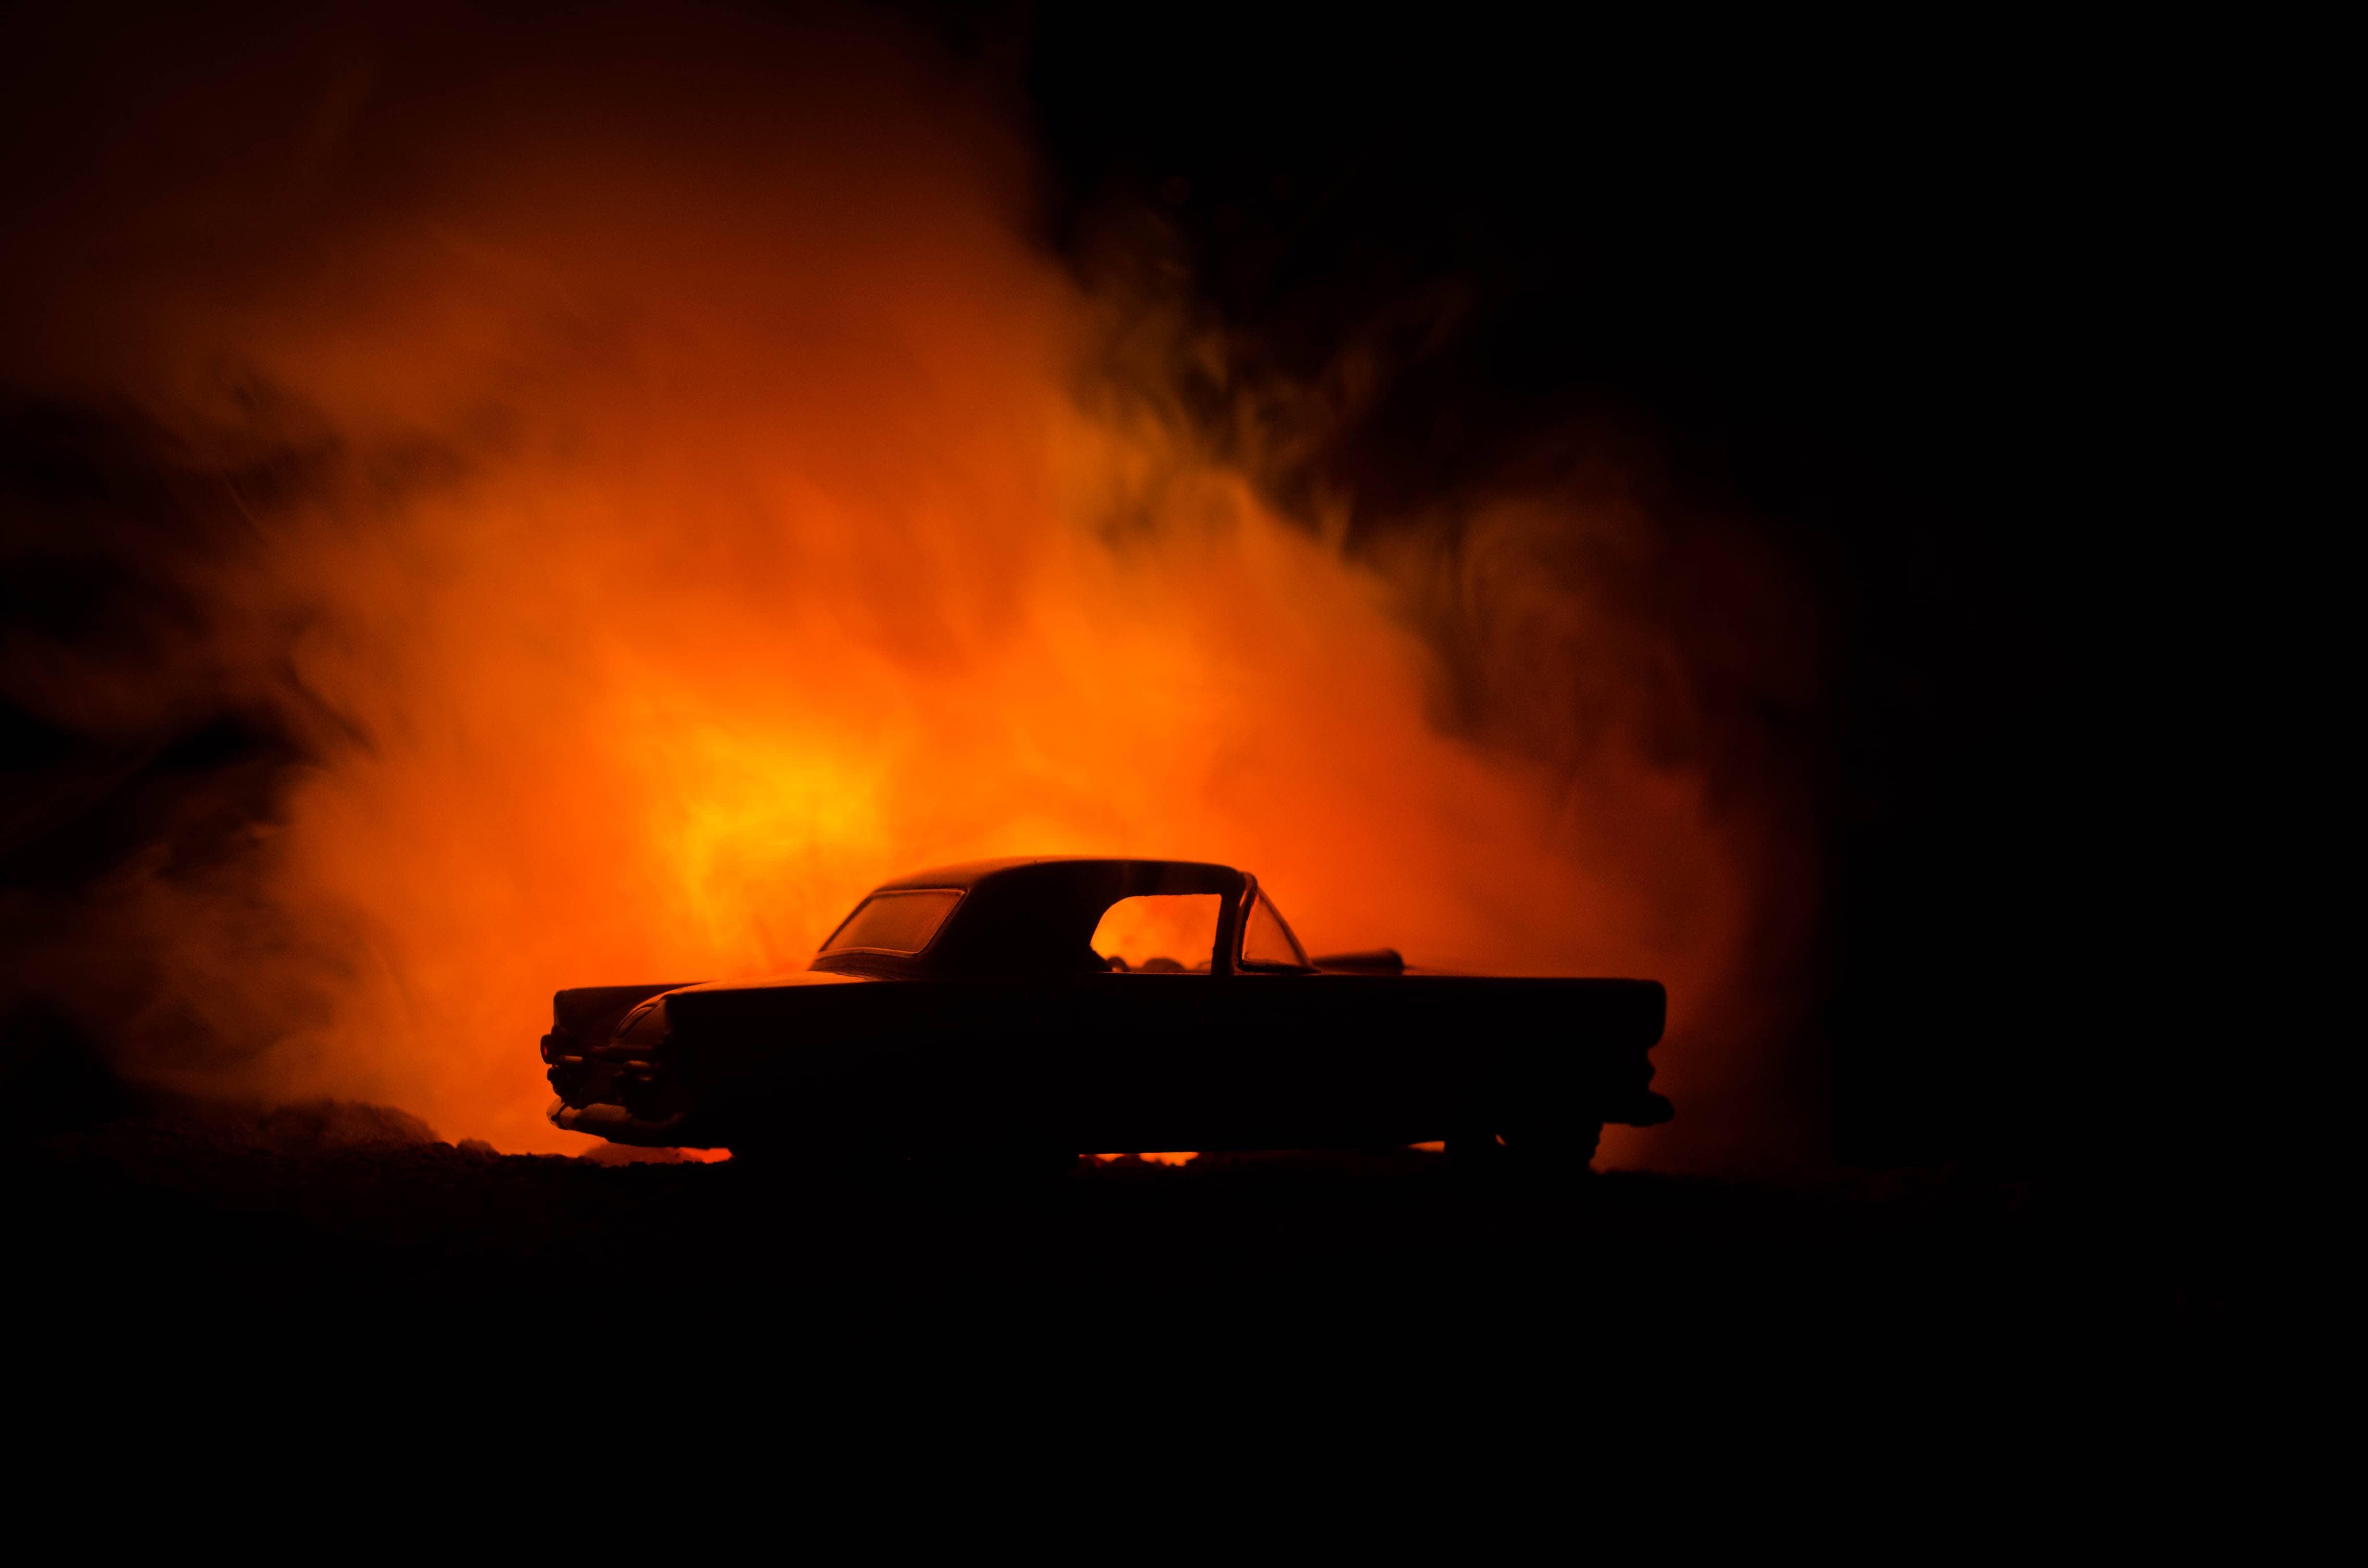 Driver Injured in Interstate 5 Fiery Vehicle Crash [Merced, CA]